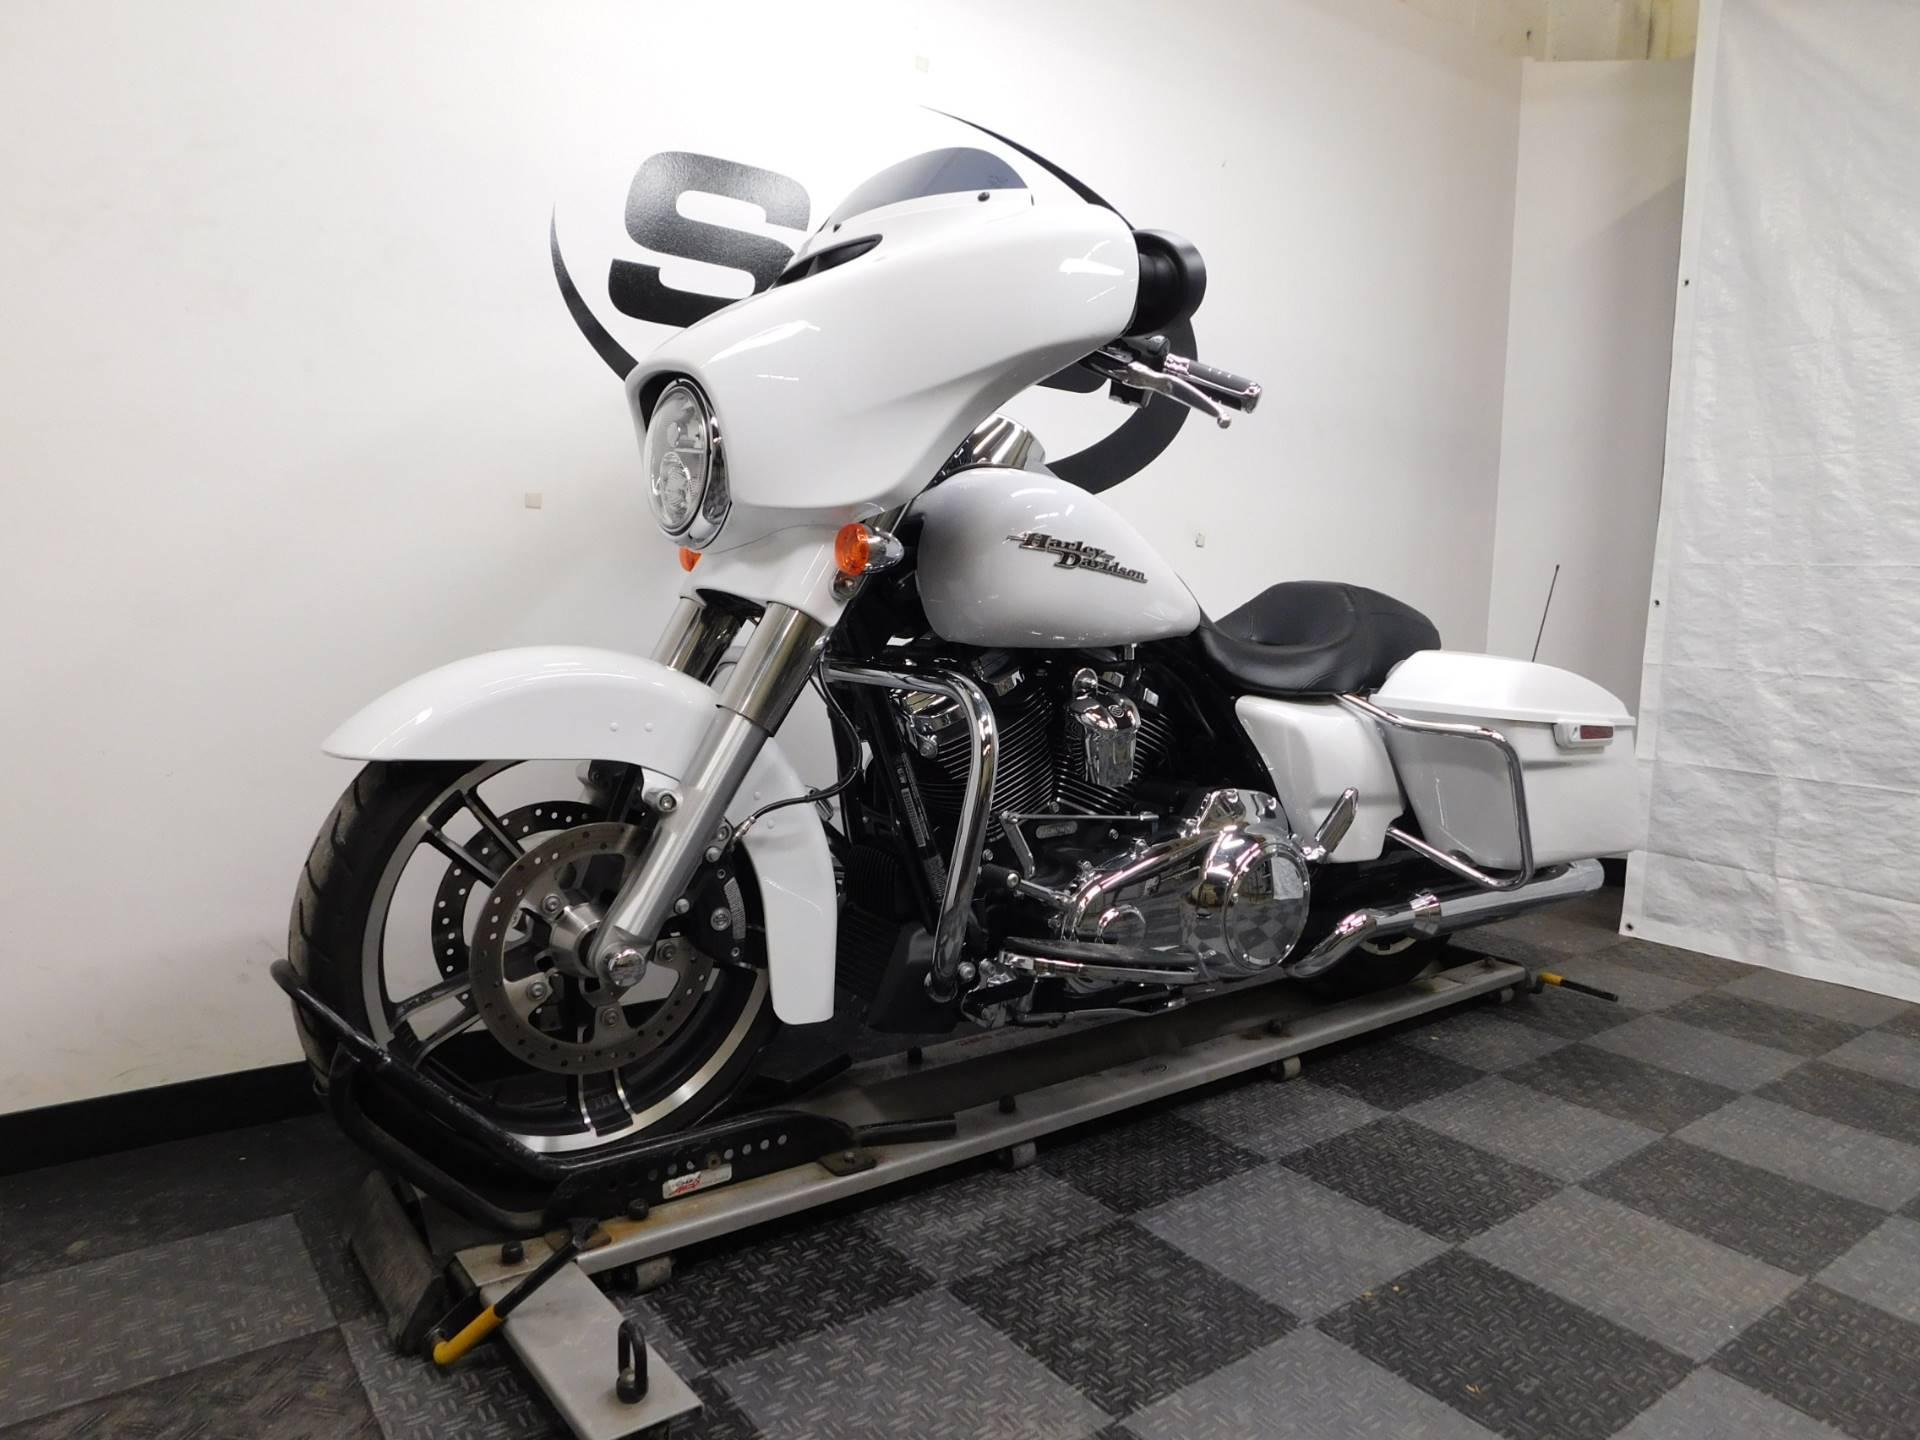 2017 Harley-Davidson Street Glide Special 4